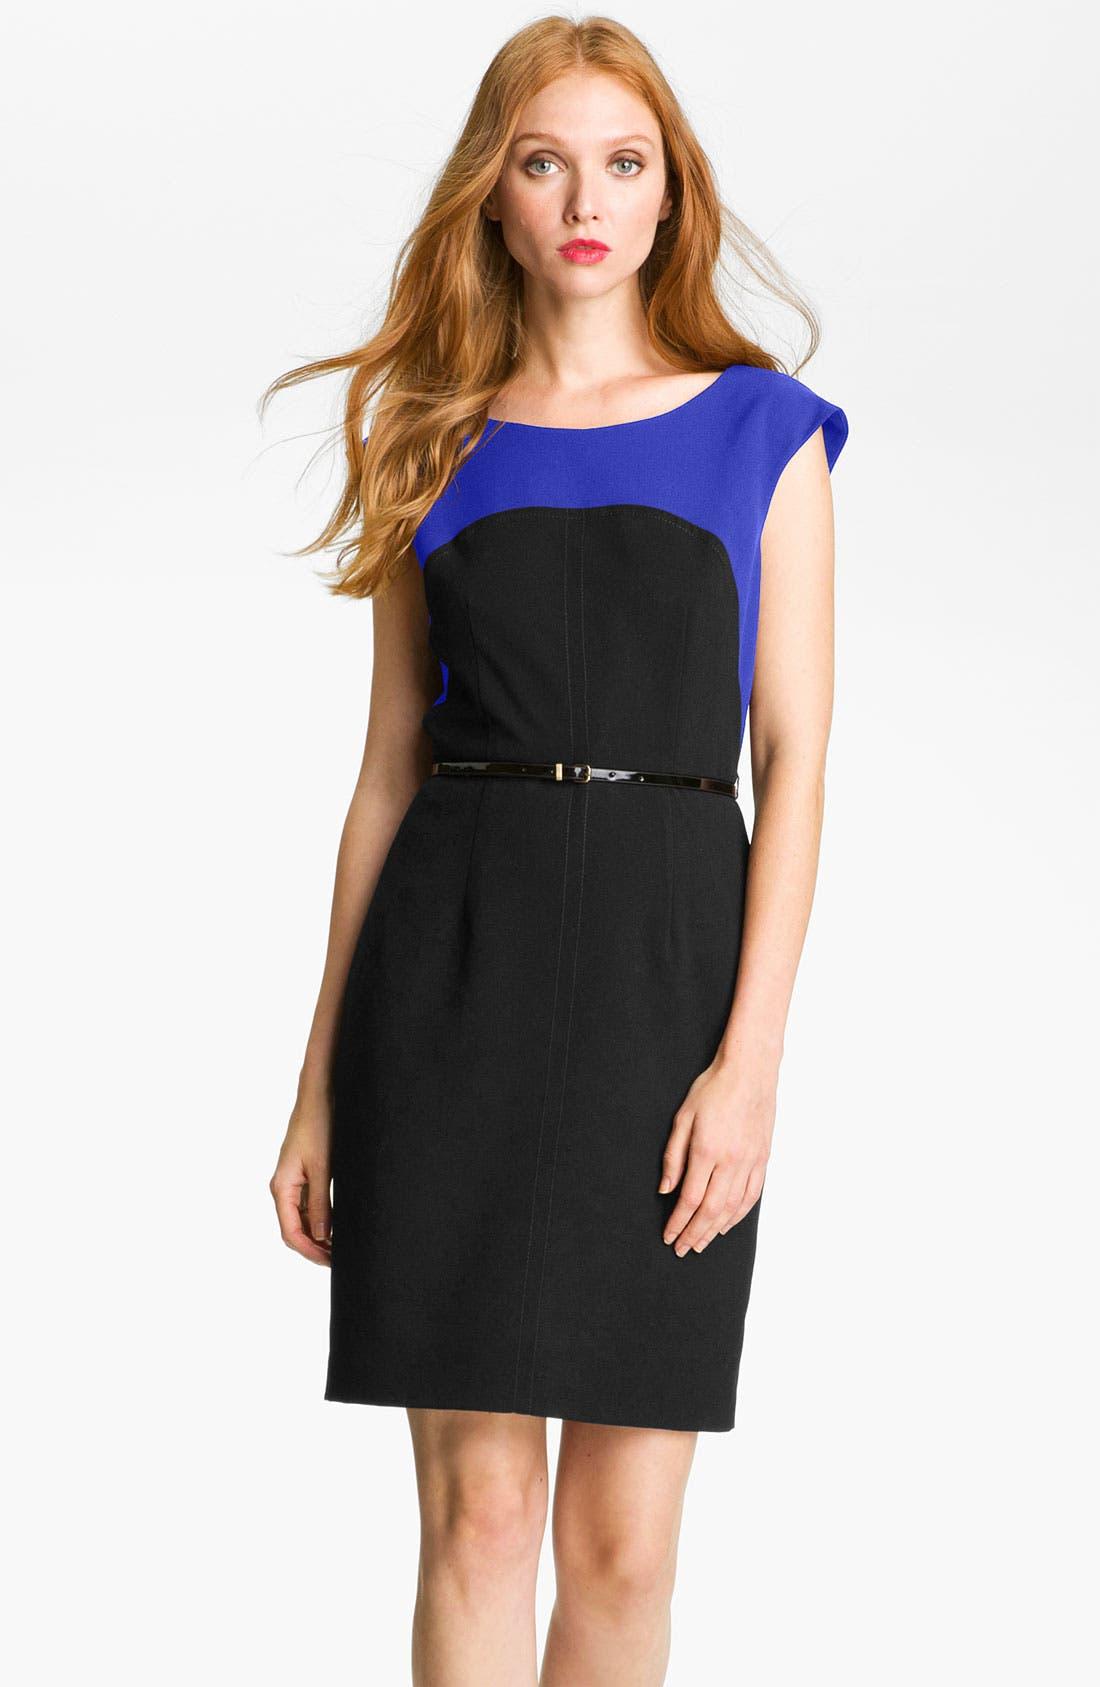 Alternate Image 1 Selected - Calvin Klein Colorblock Belted Sheath Dress